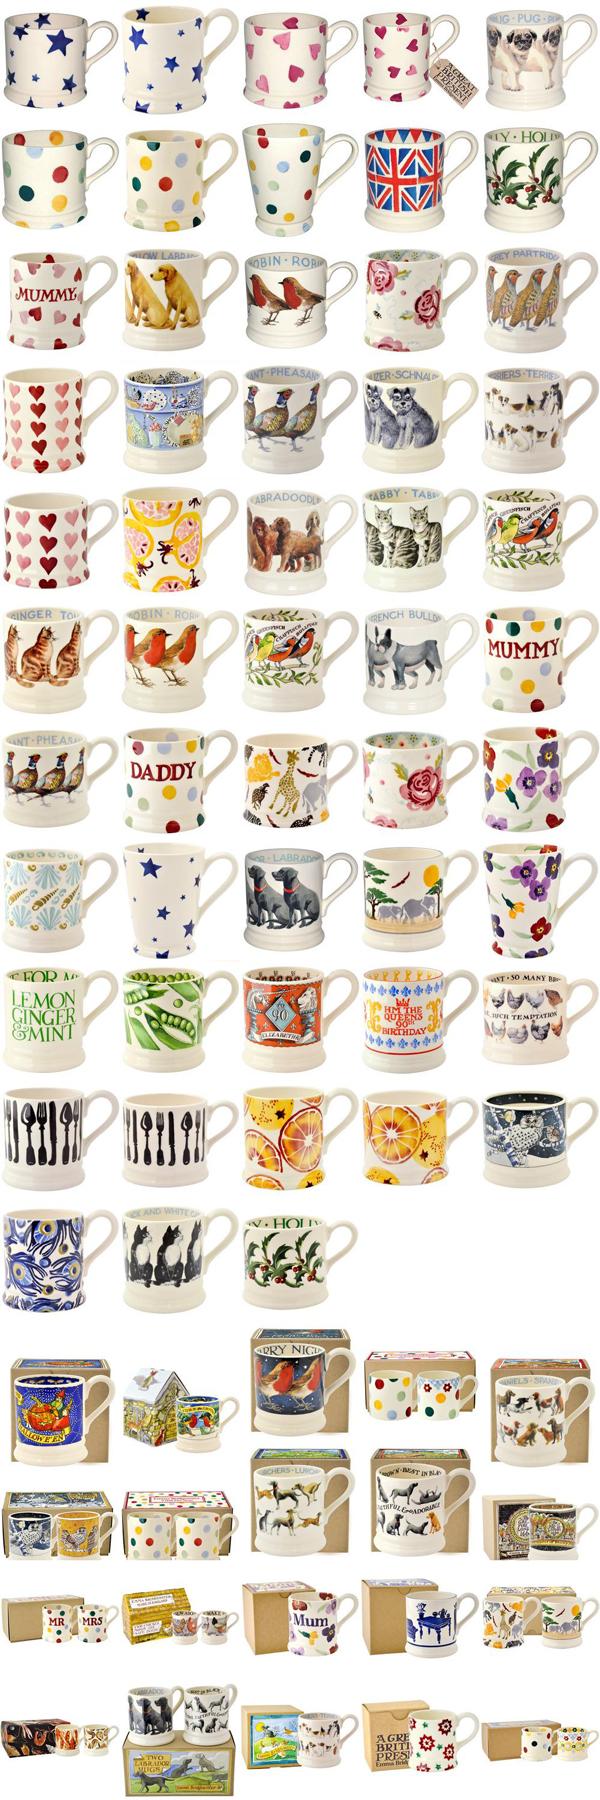 emma-bridgewater-mugs-1